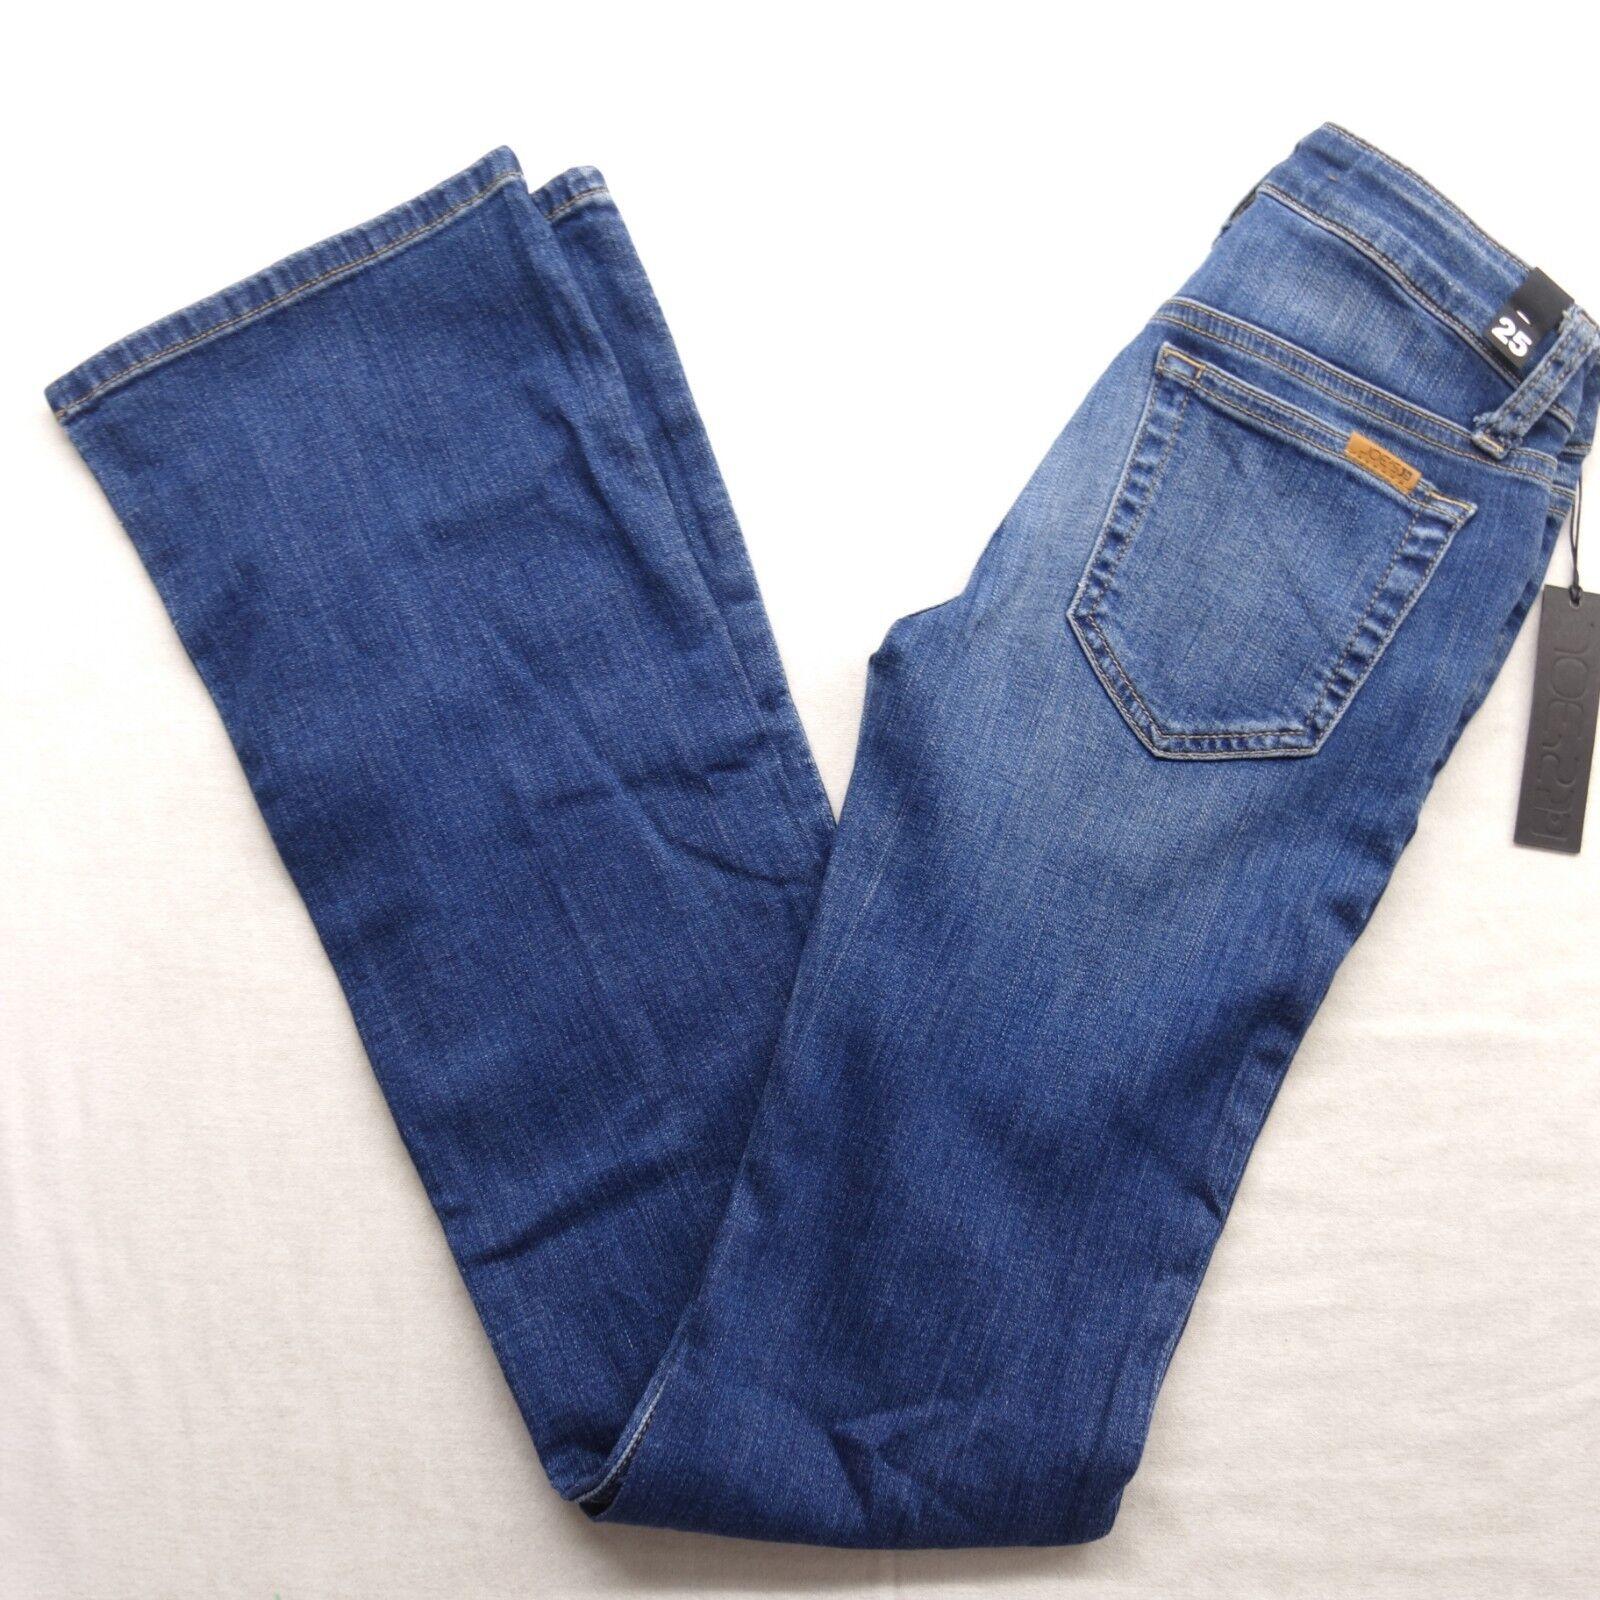 New Joe's Womens Medium bluee The Honey Curvy Bootcut Denim Jeans Pants 25 x 34